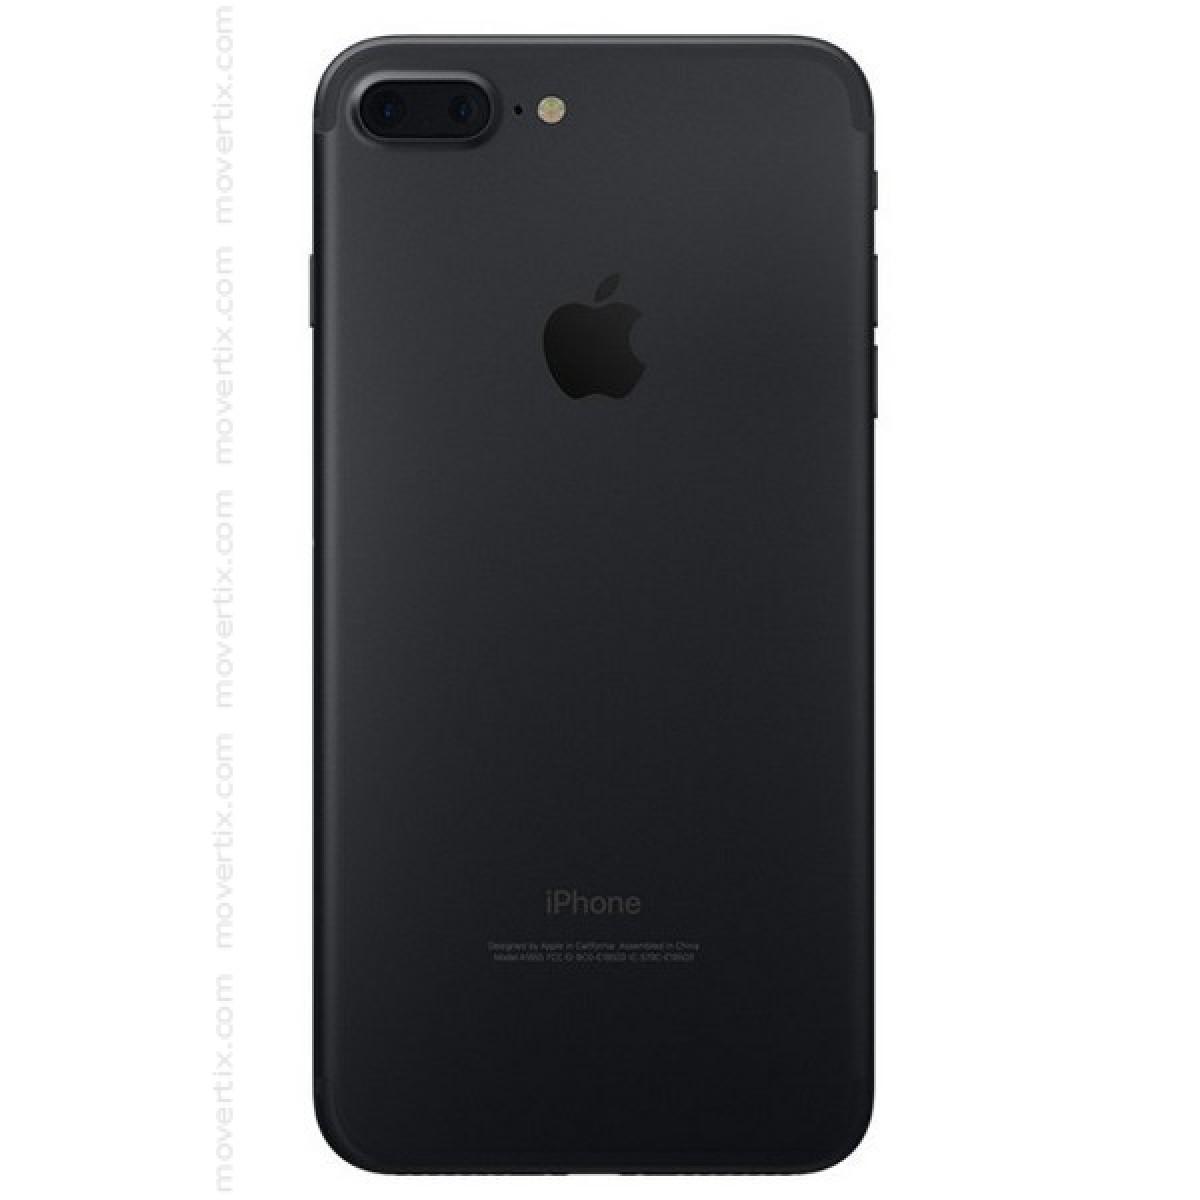 Apple iPhone 7 Plus Black 32GB (0190198156082) | Movertix Mobile Phones Shop